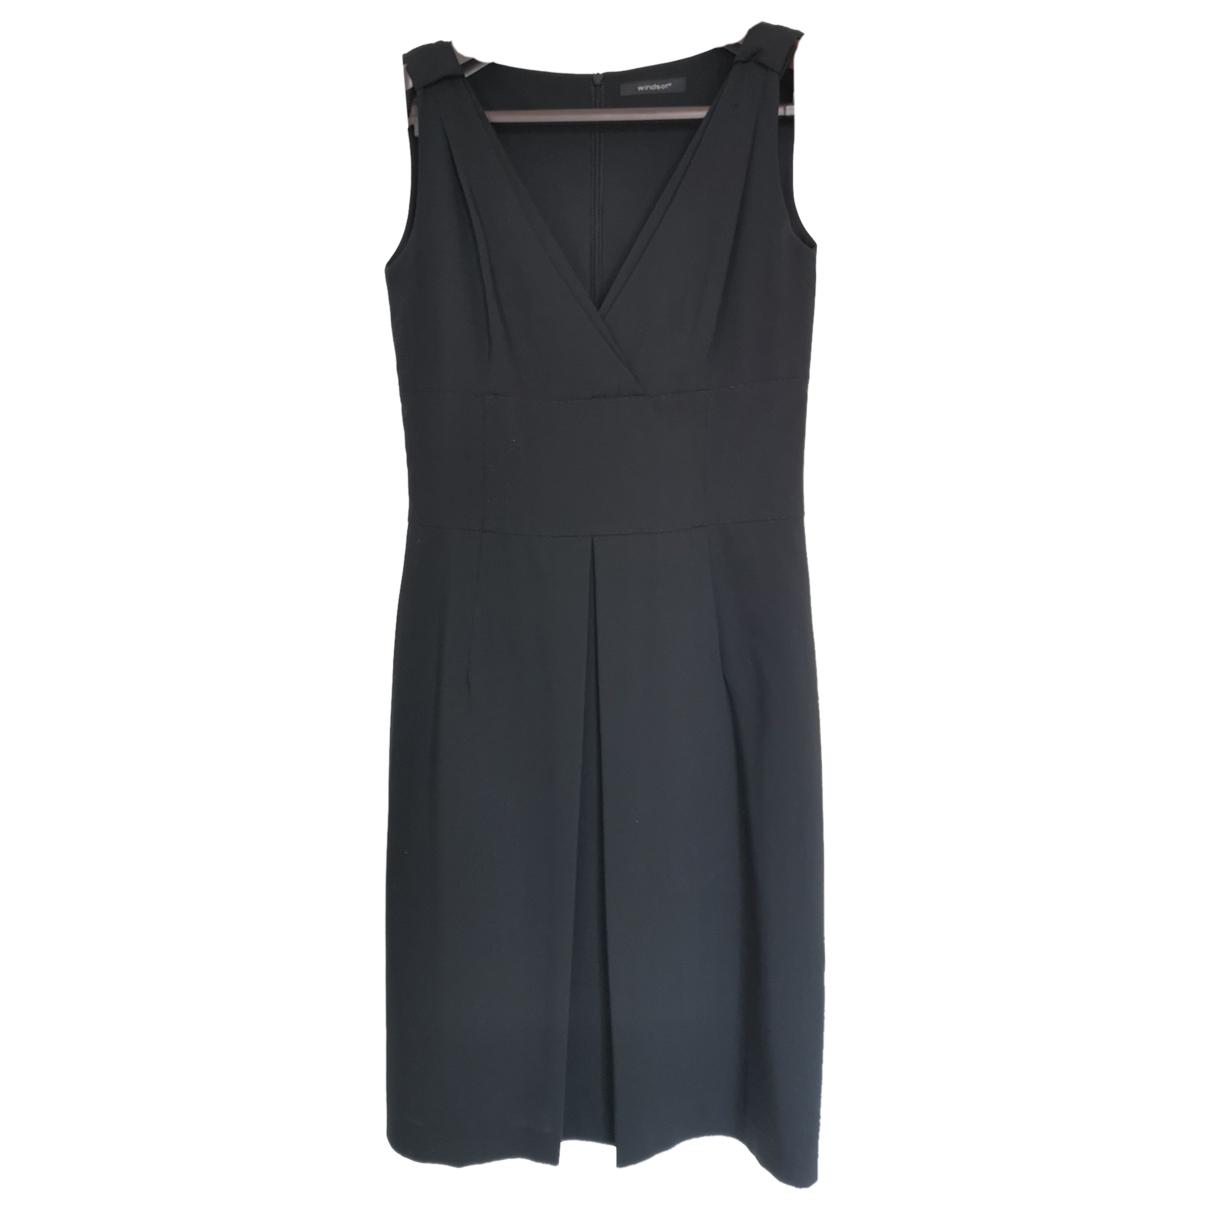 Windsor \N Kleid in  Anthrazit Wolle